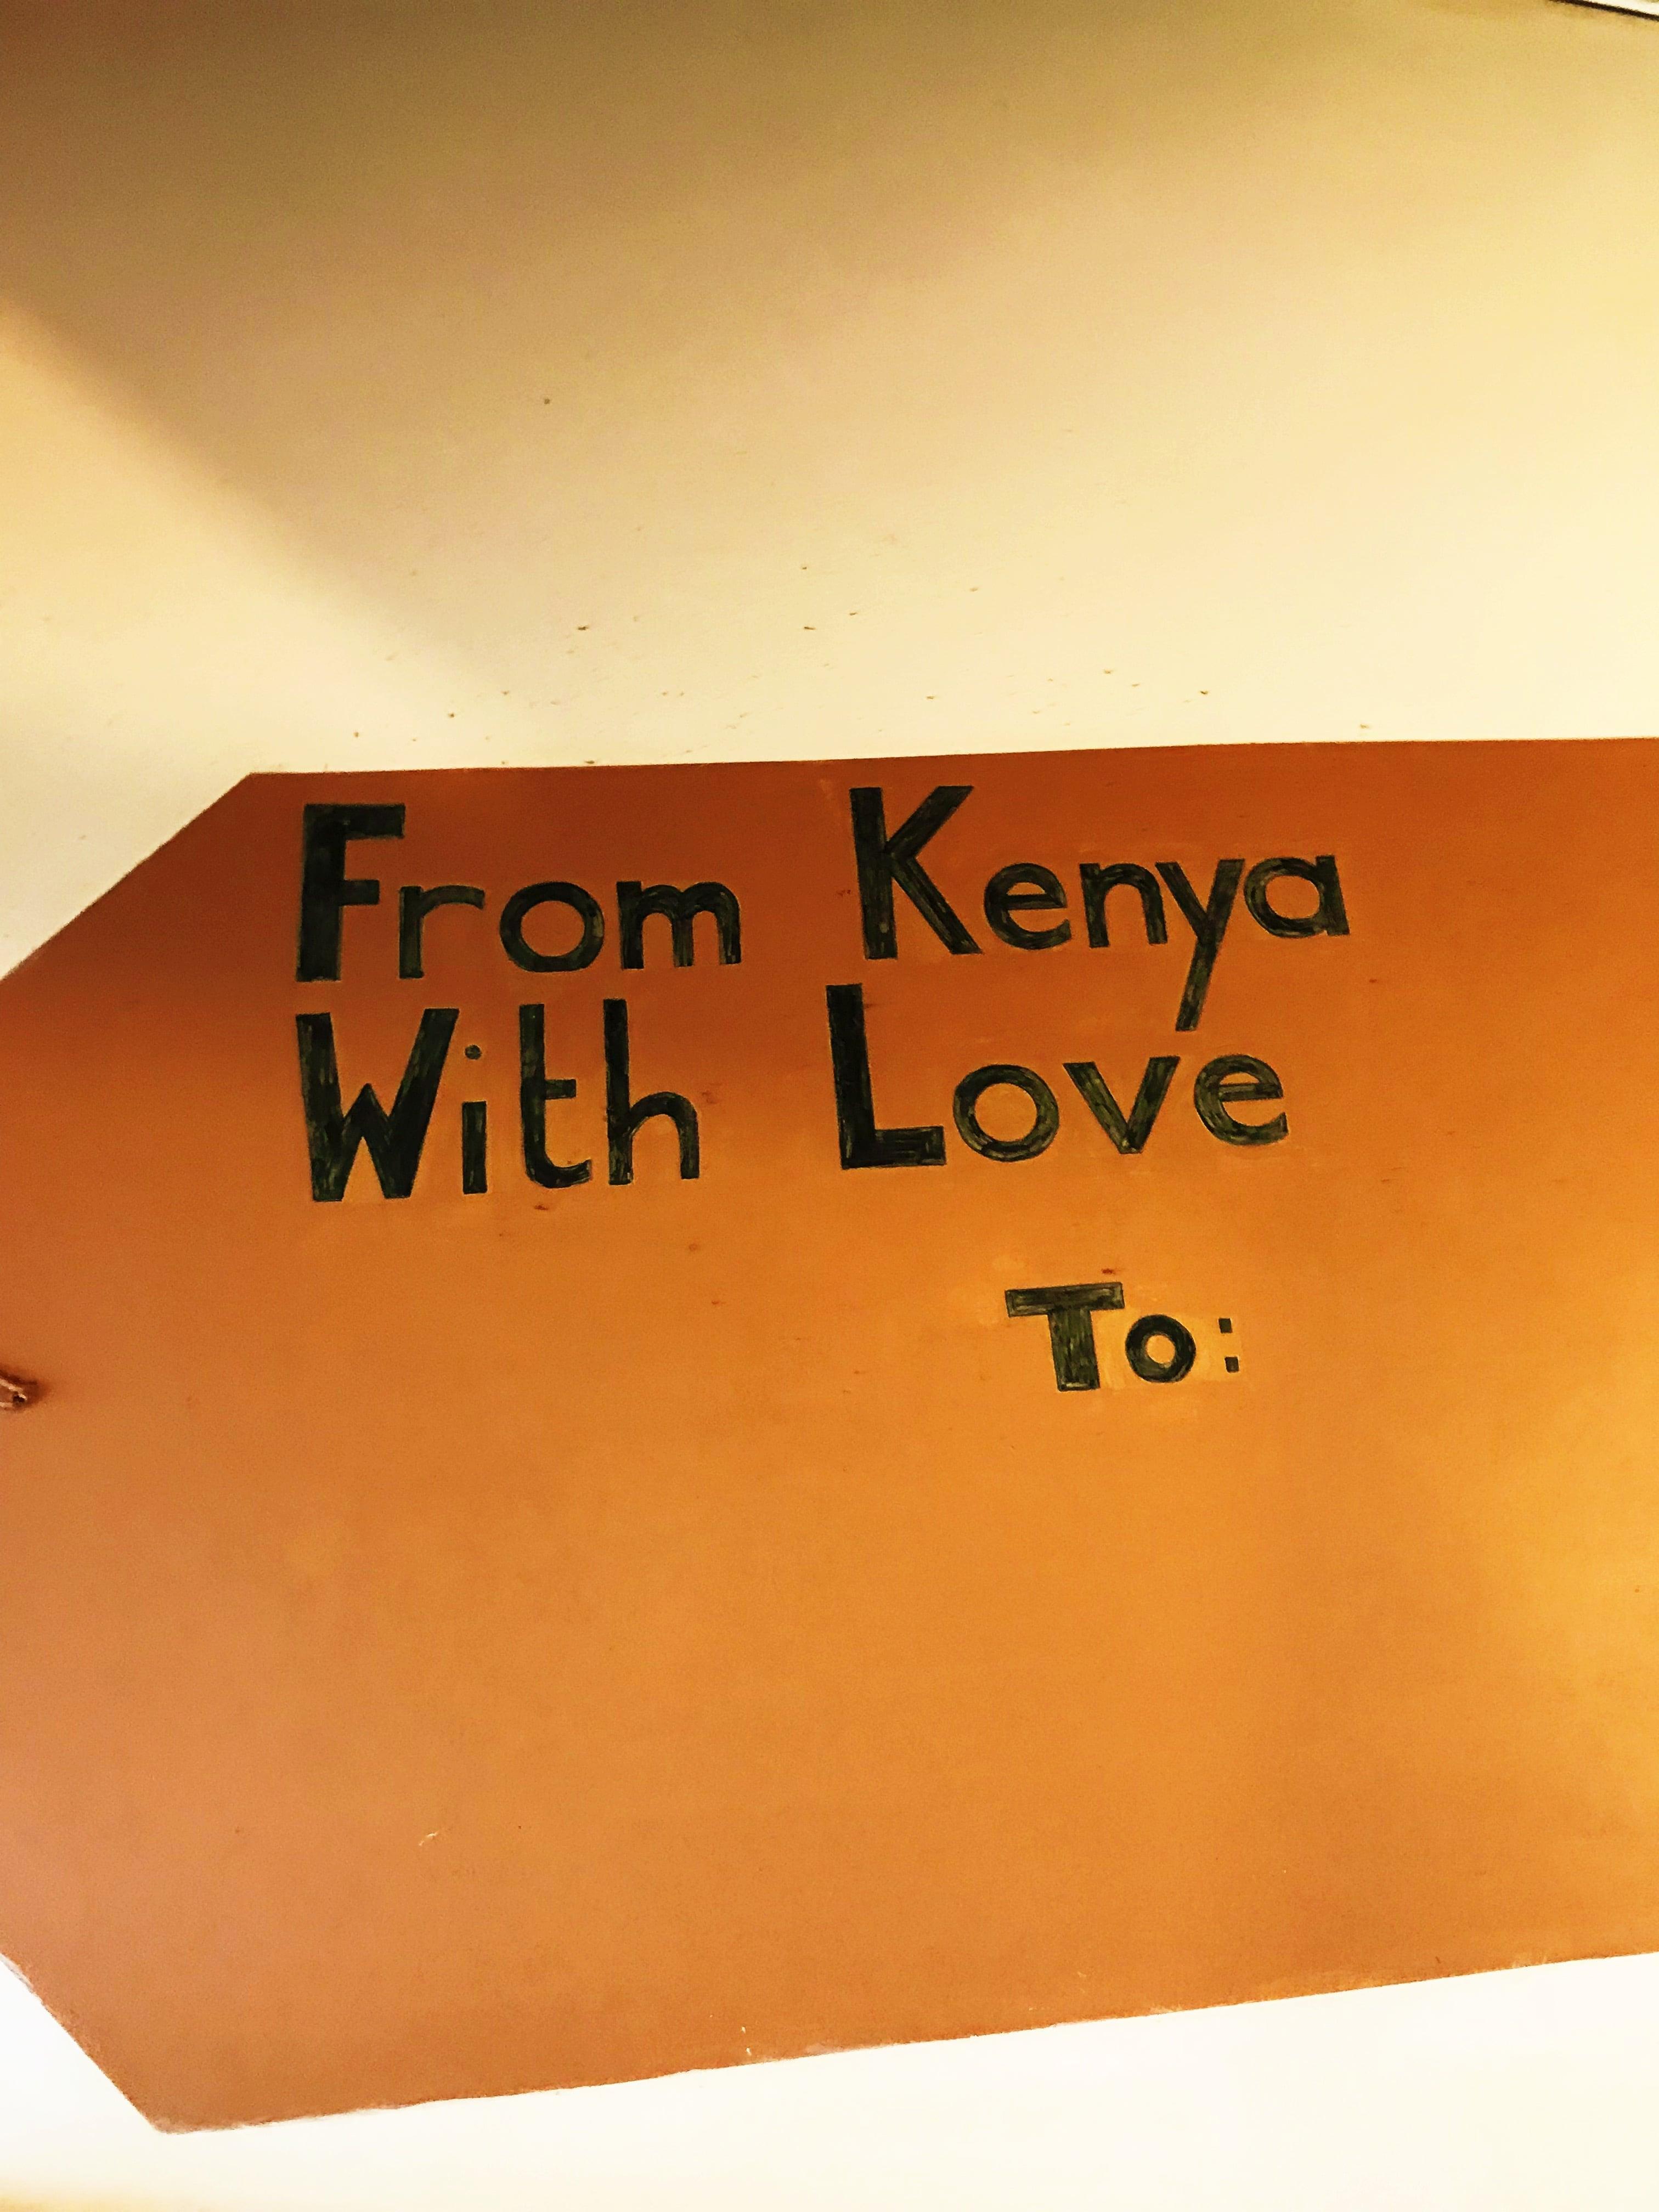 How To Spend 24 Hours In Nairobi, Kenya - Hemingways Nairobi - What to do in Nairobi - Nairobi, Kenya - Kenya Safari - Kenya Safari Tours - Safari Kenya - Safari Trips In Kenya - Trip To Kenya - Kenyan Safari - How To Plan A Safari - Kenya Safari Guide - Kenya Wildlife - Kenya Trip - Travel To Kenya - Guide To Kenya